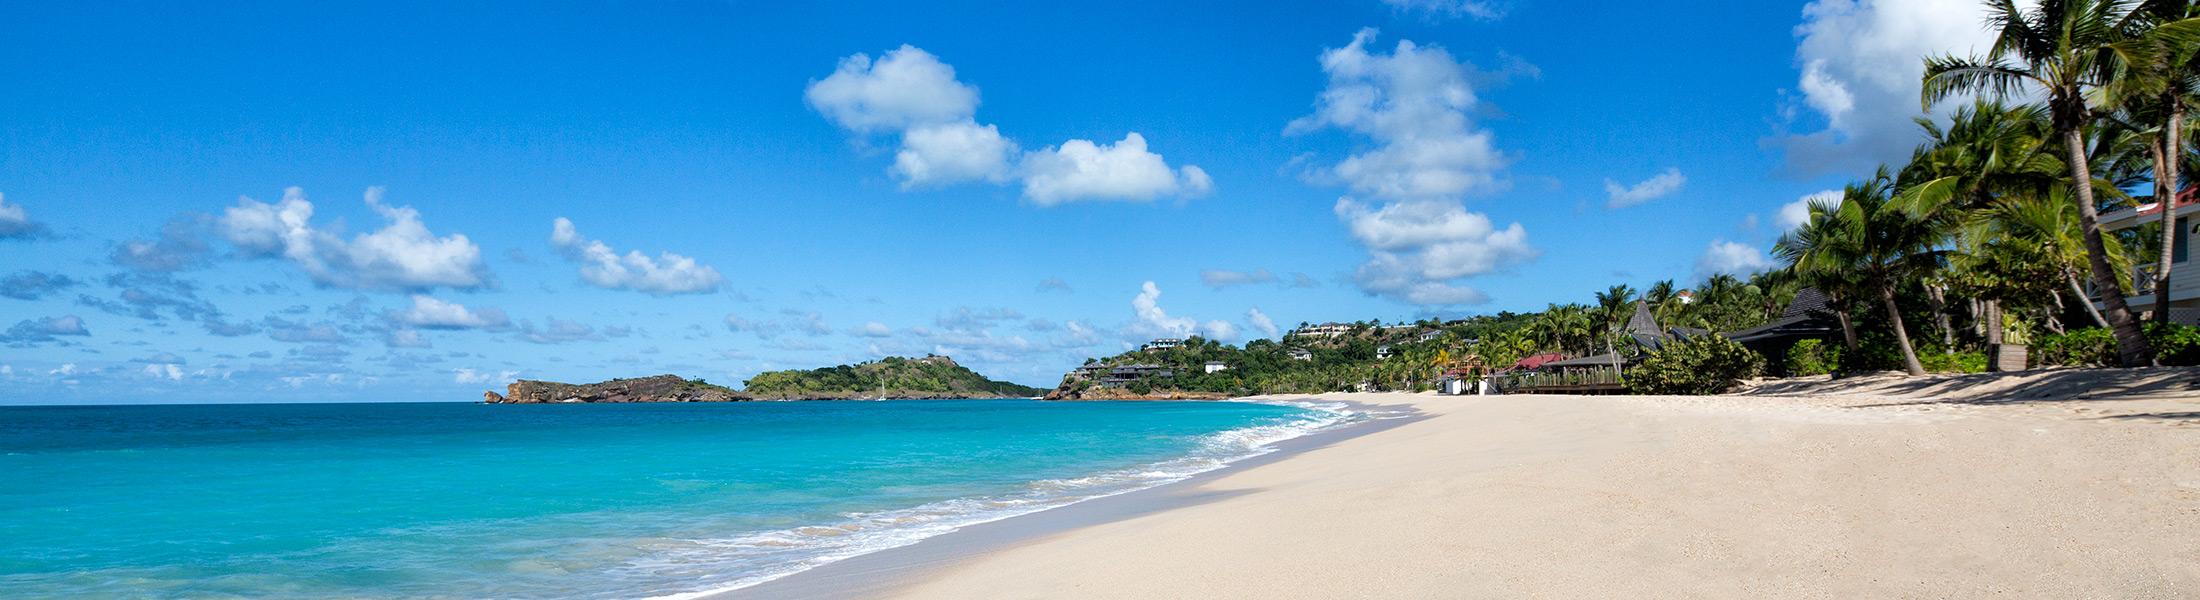 White sand beach at Galley Bay Resort & Spa